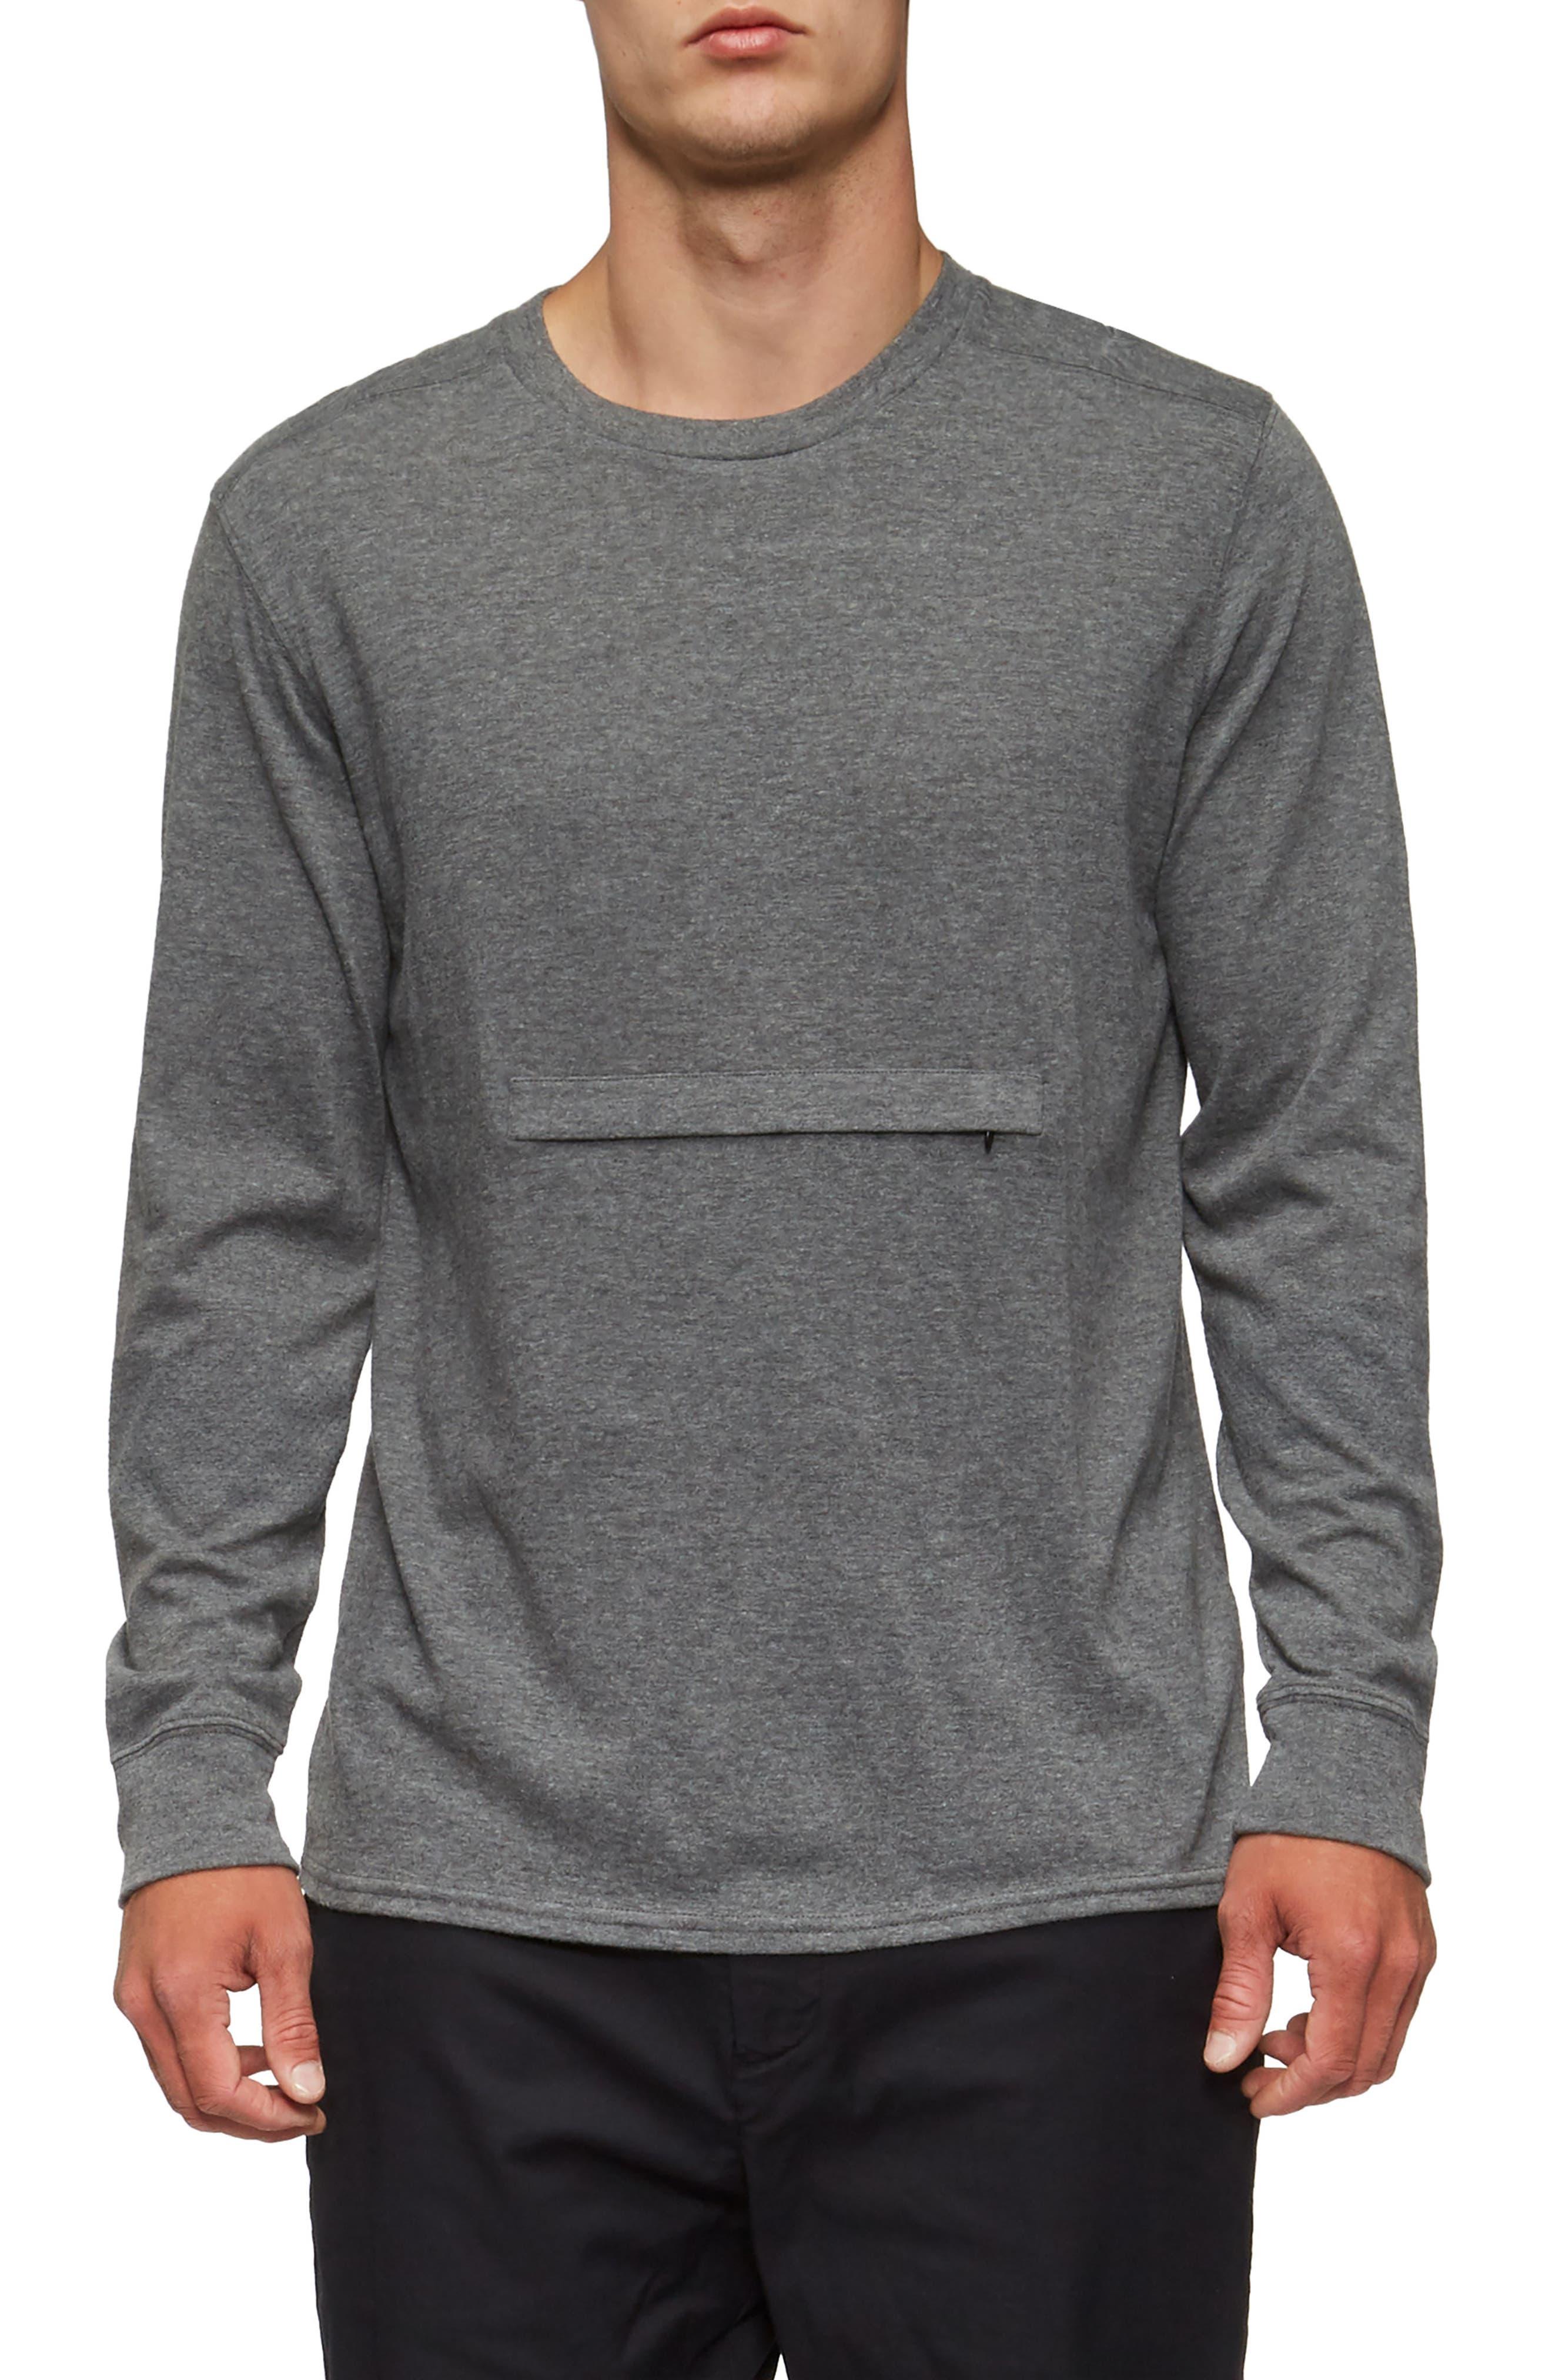 Lowell Long Sleeve T-Shirt,                         Main,                         color, Heather Grey